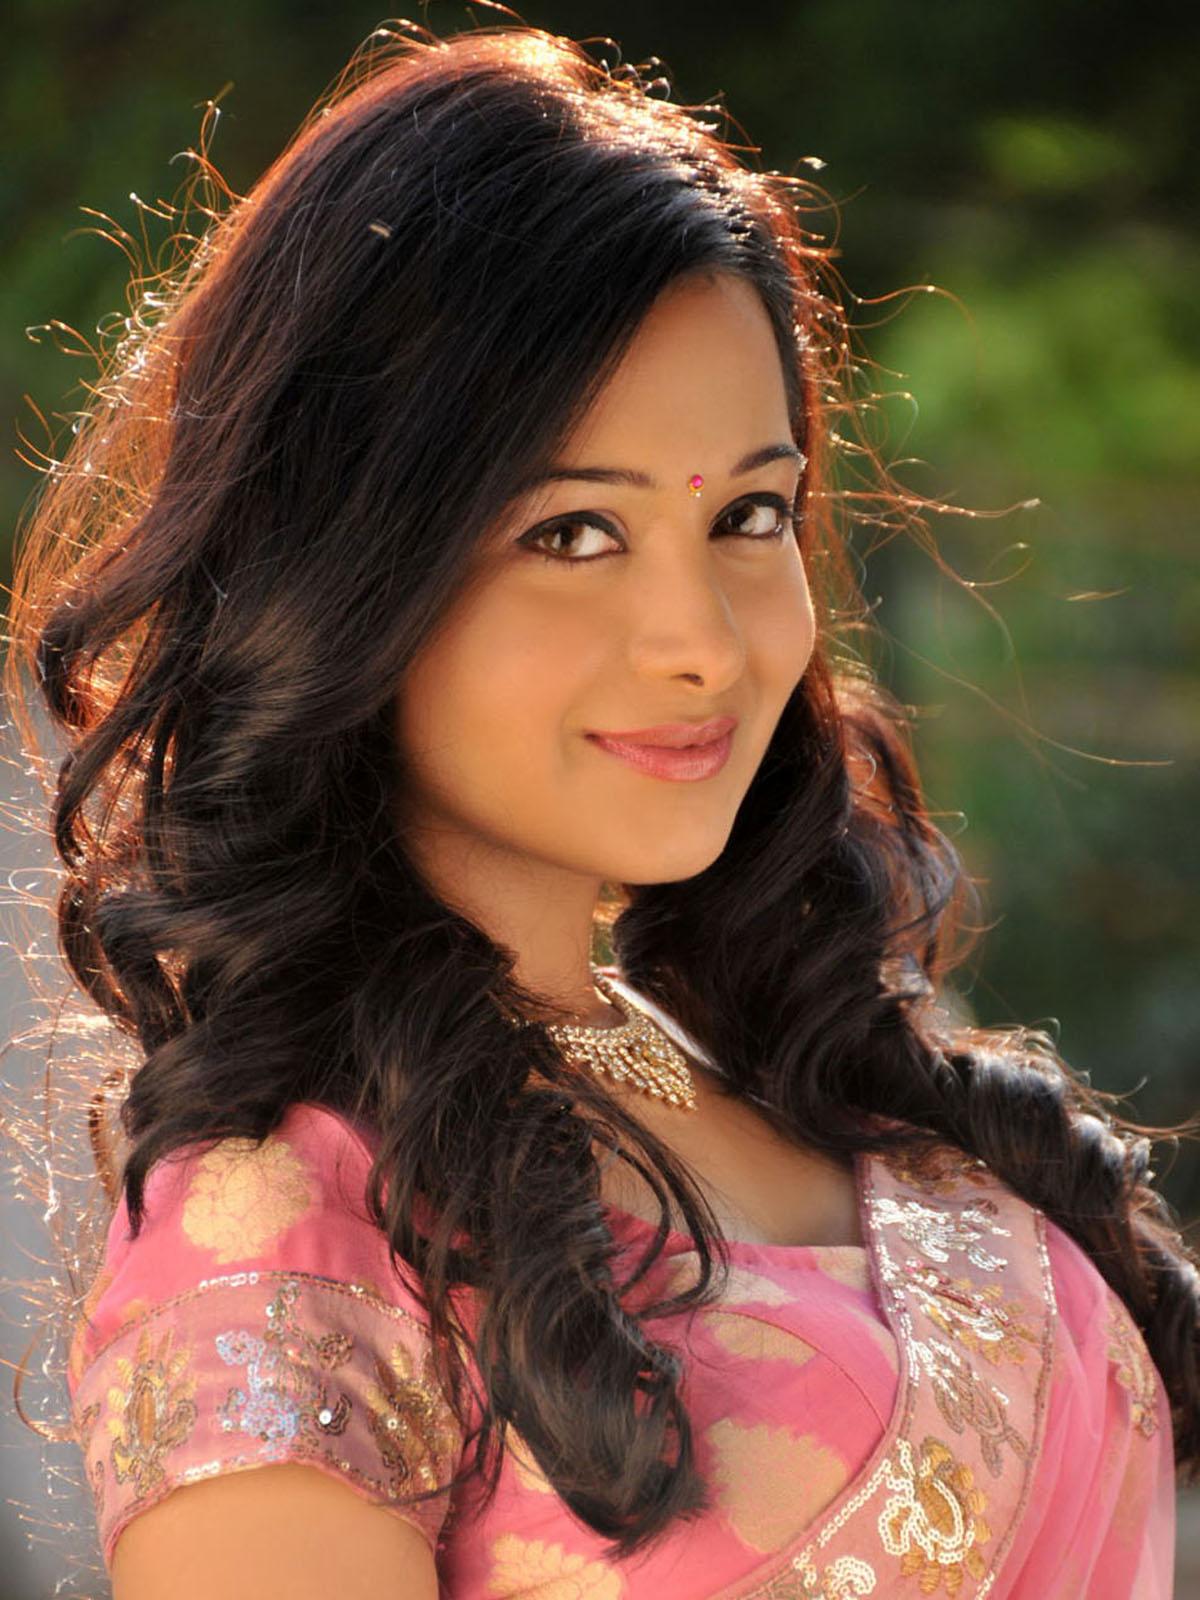 Articleshpk actress preetika rao wallpapers highest paying keywords articles - Indian beautiful models hd wallpapers ...